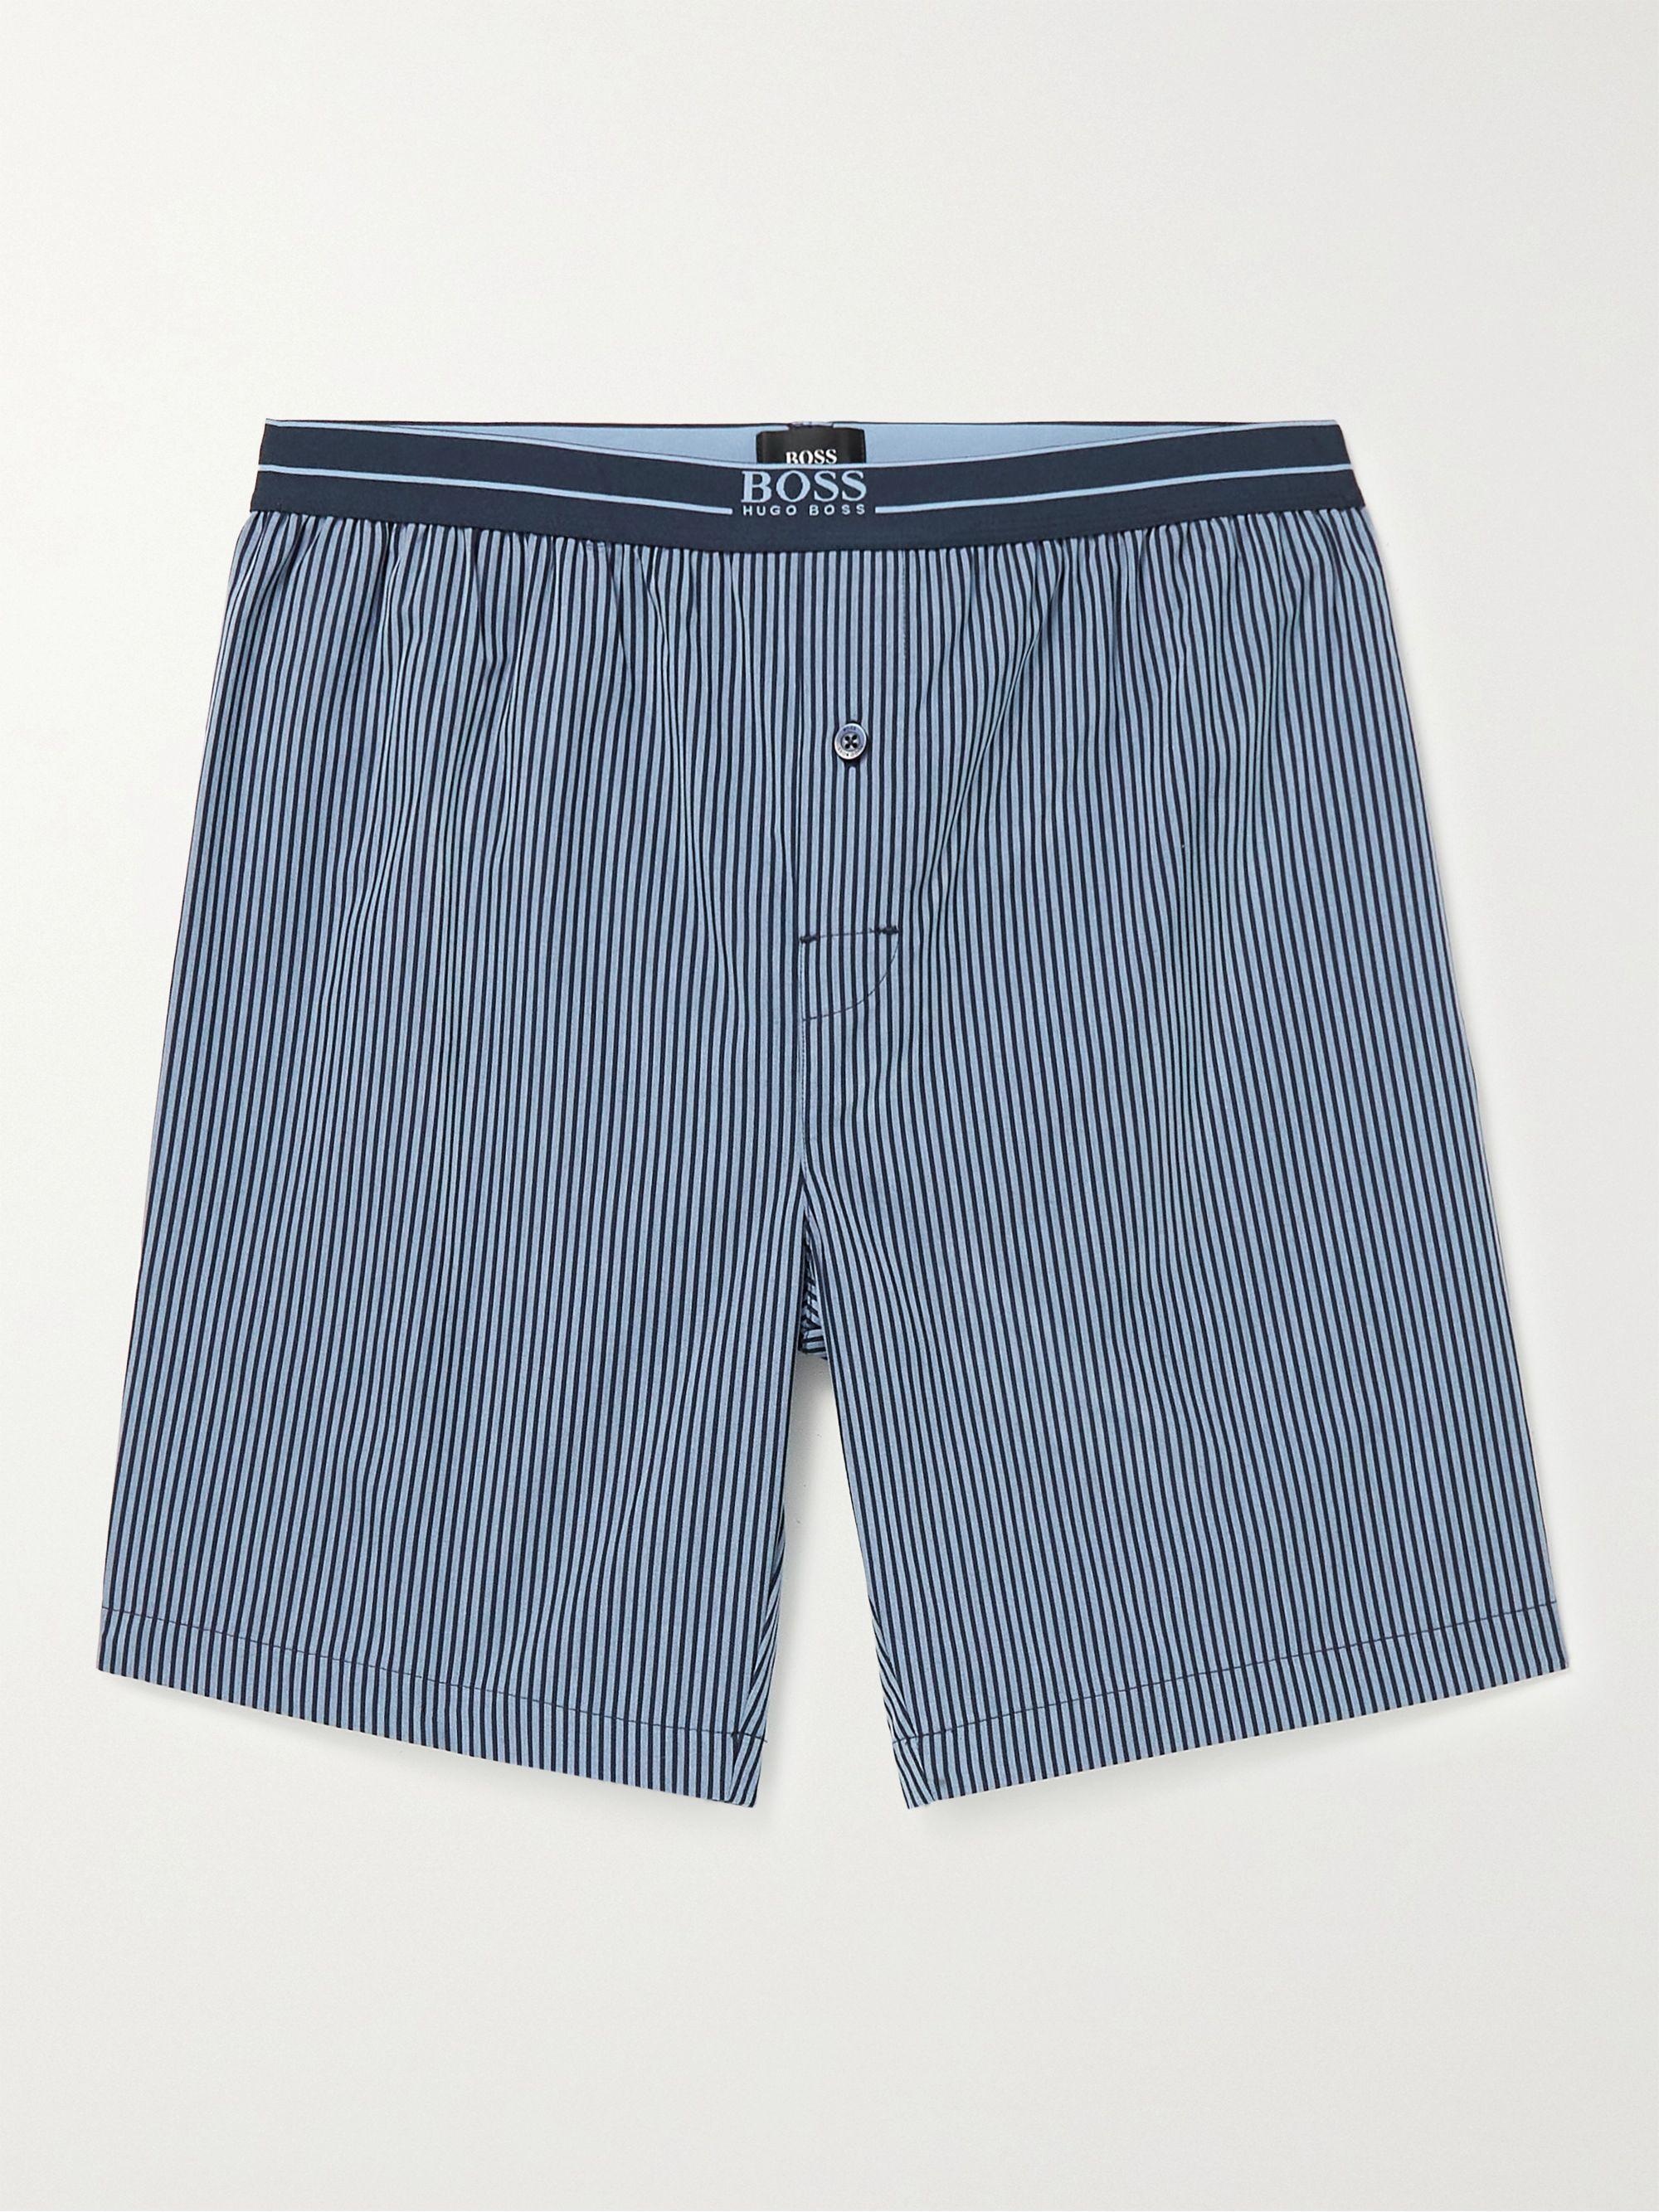 HUGO BOSS Striped Cotton-Poplin Pyjama Shorts